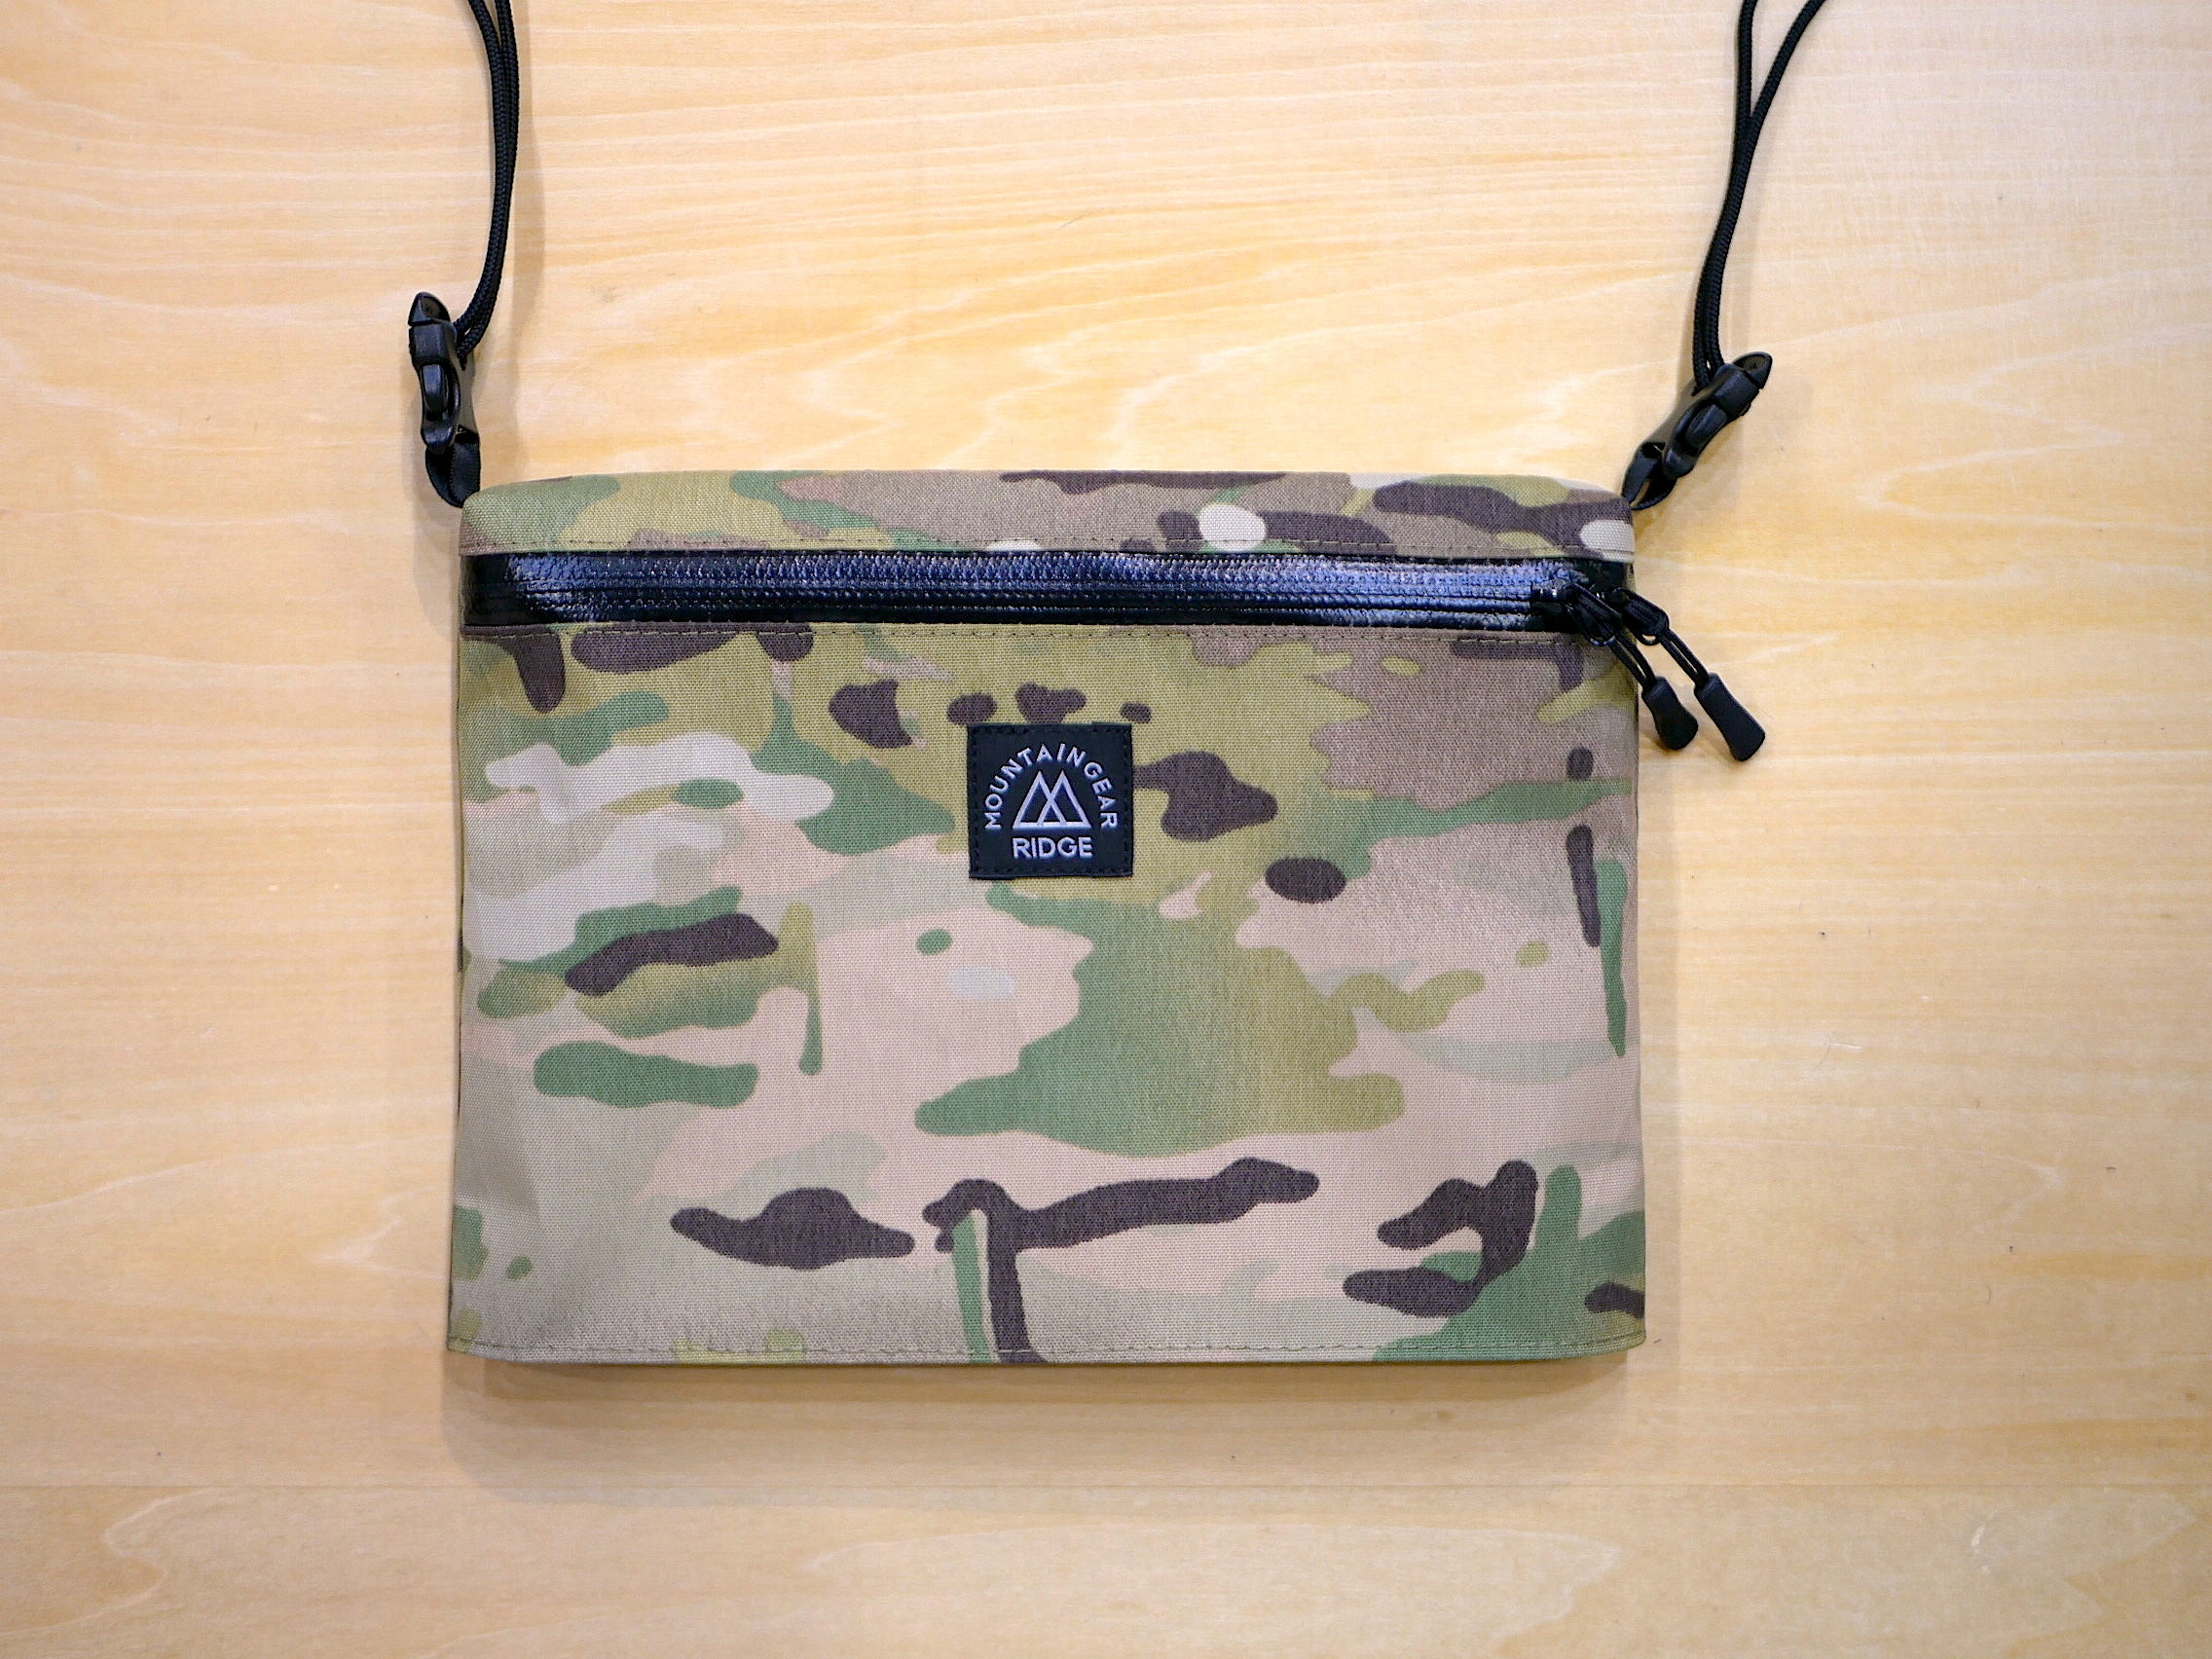 RIDGE MOUNTAIN GEAR / SHOULDER PACK